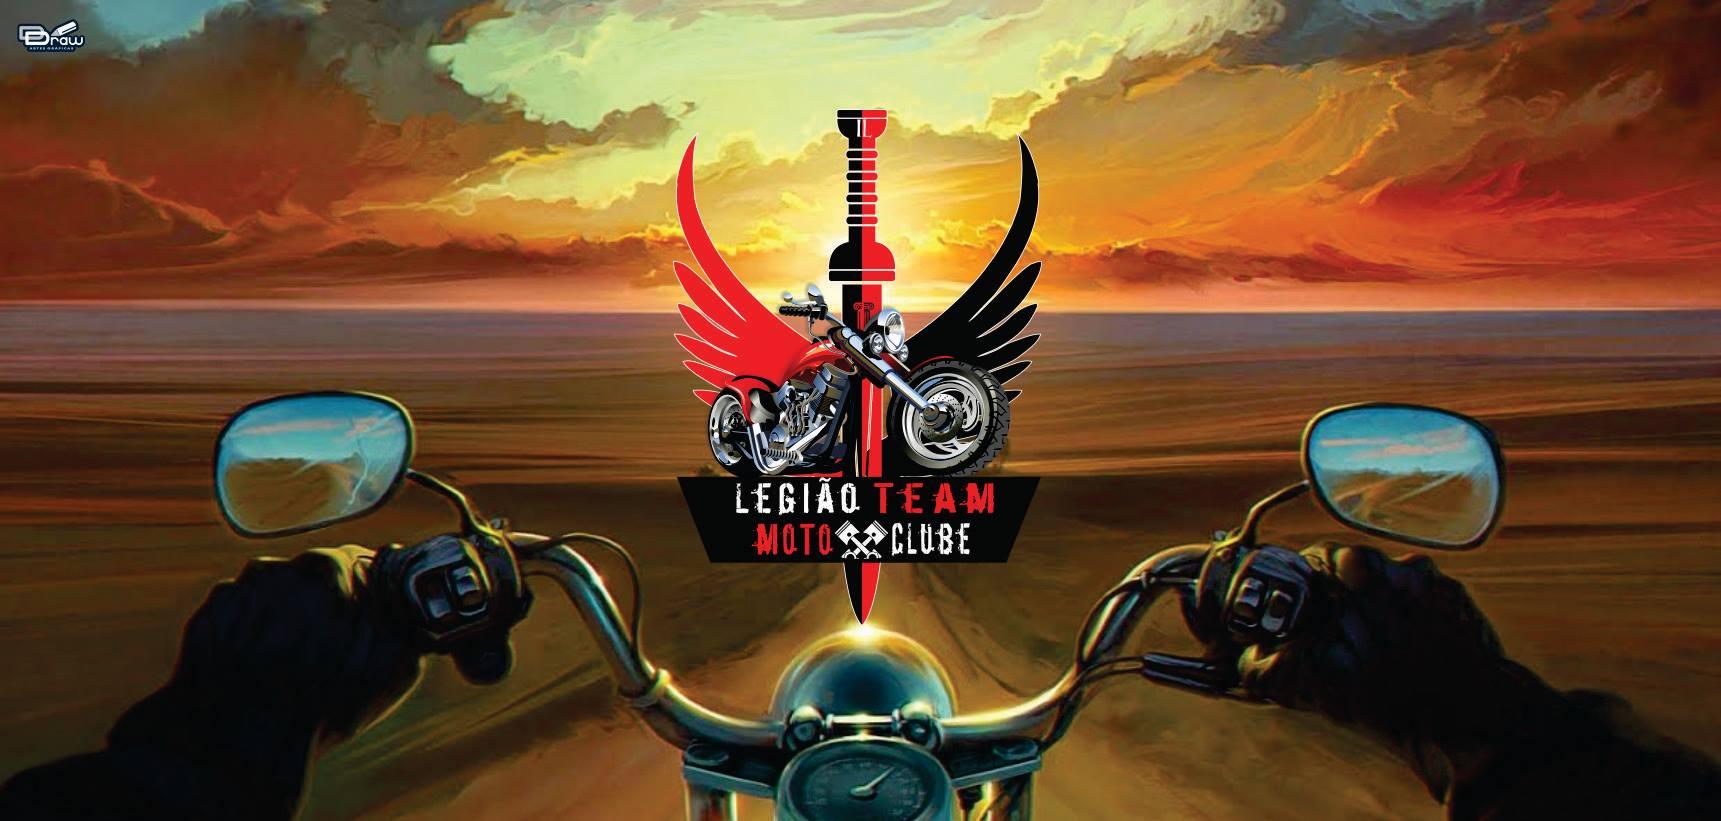 Moto Club Legião Team Fan Page